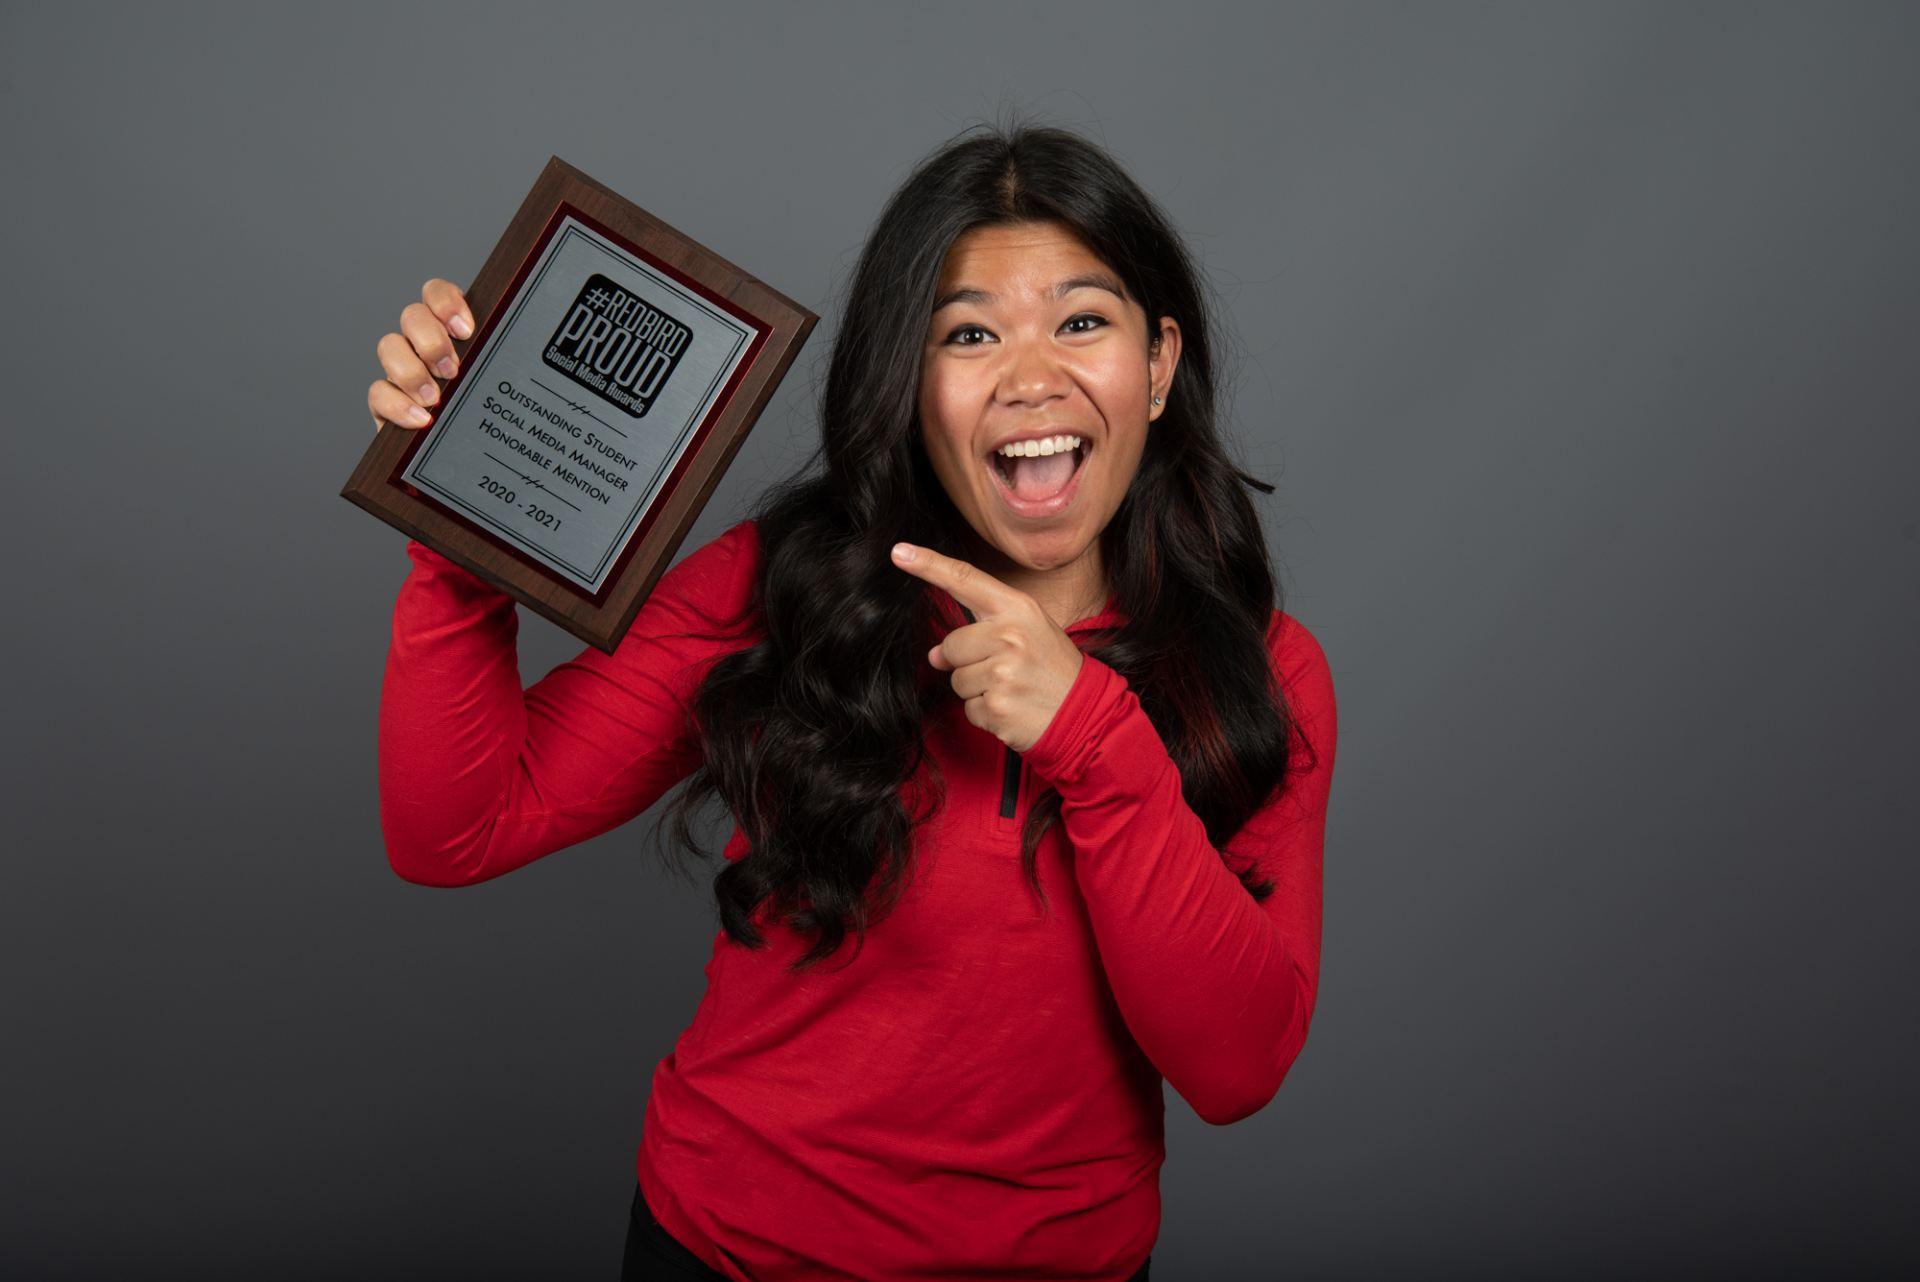 Leia Atas posed with award